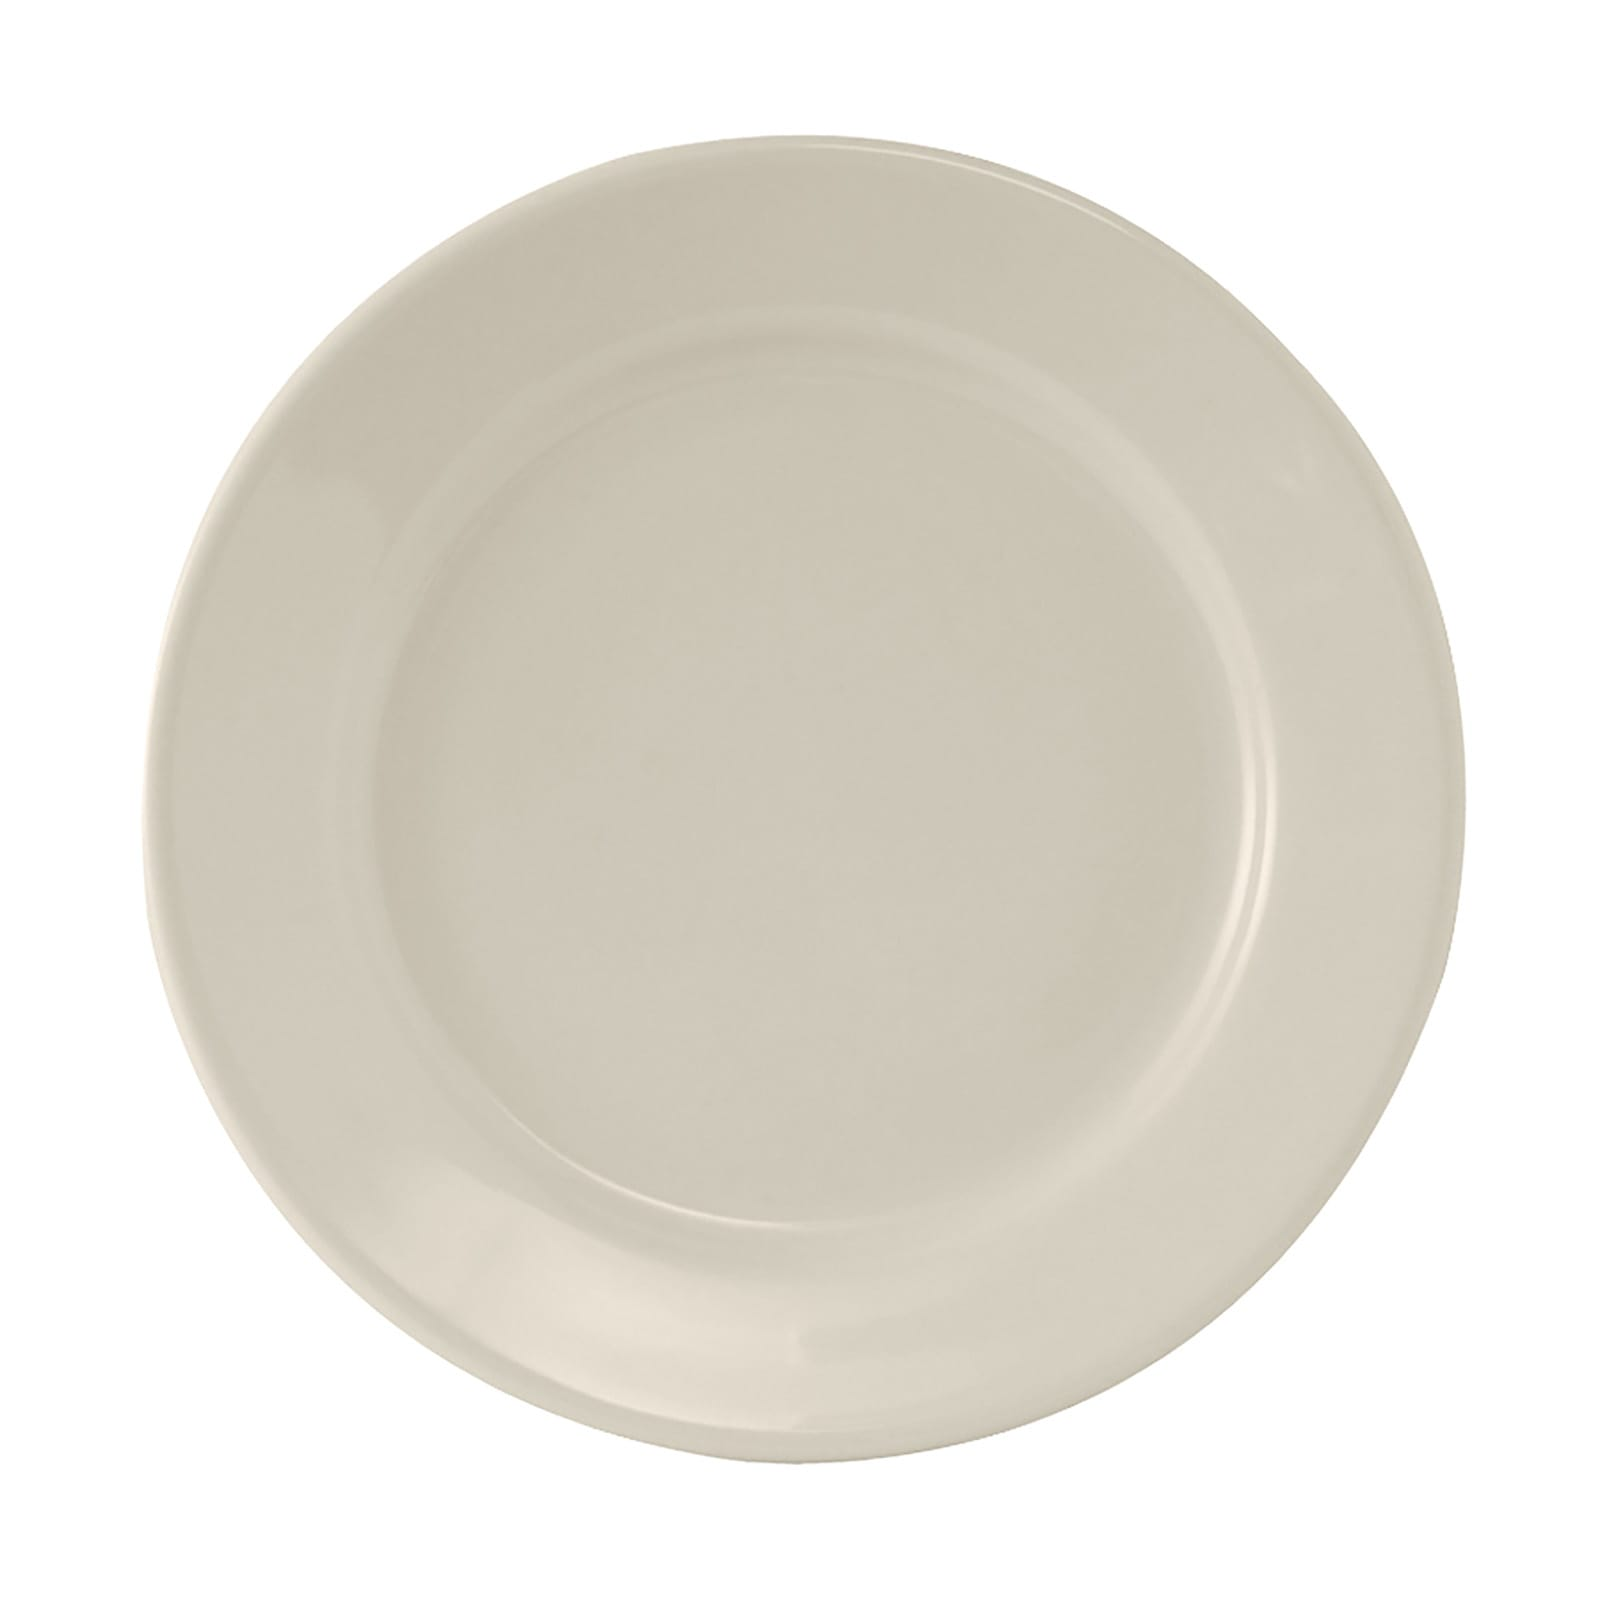 "Tuxton TRE-908 9"" Round Reno Plate - Ceramic, American White"